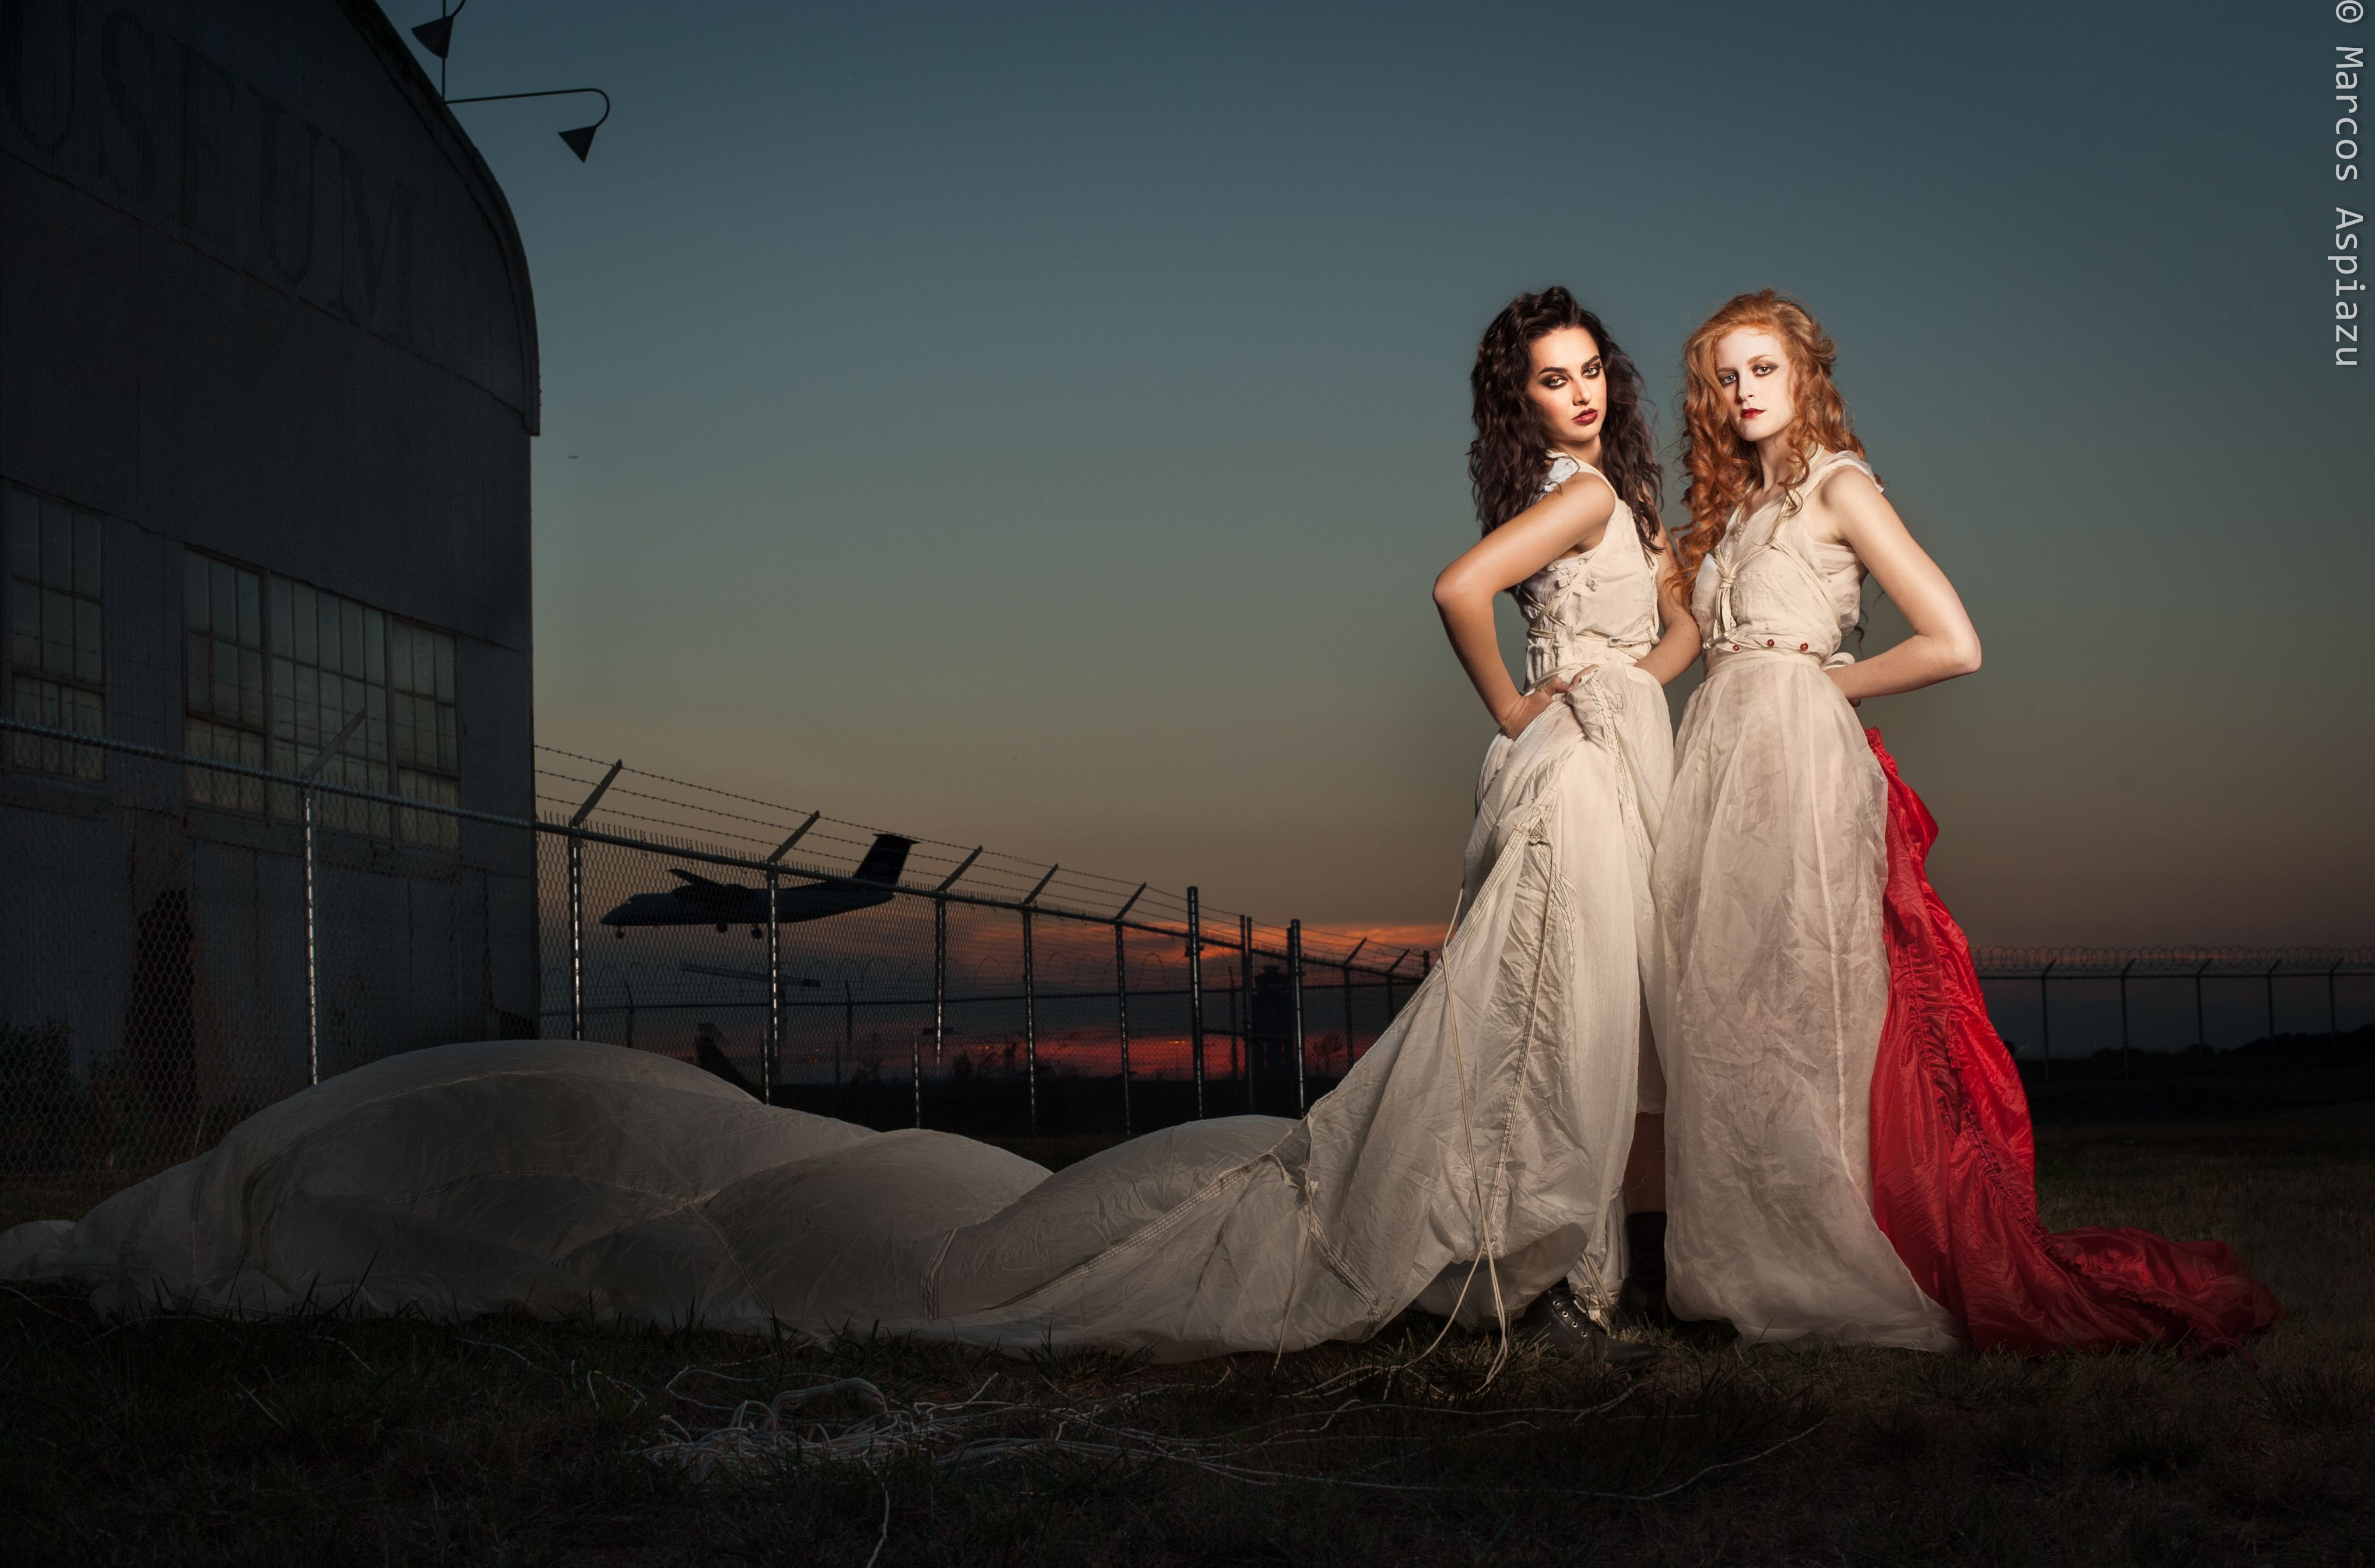 wedding dress rental for photoshoot